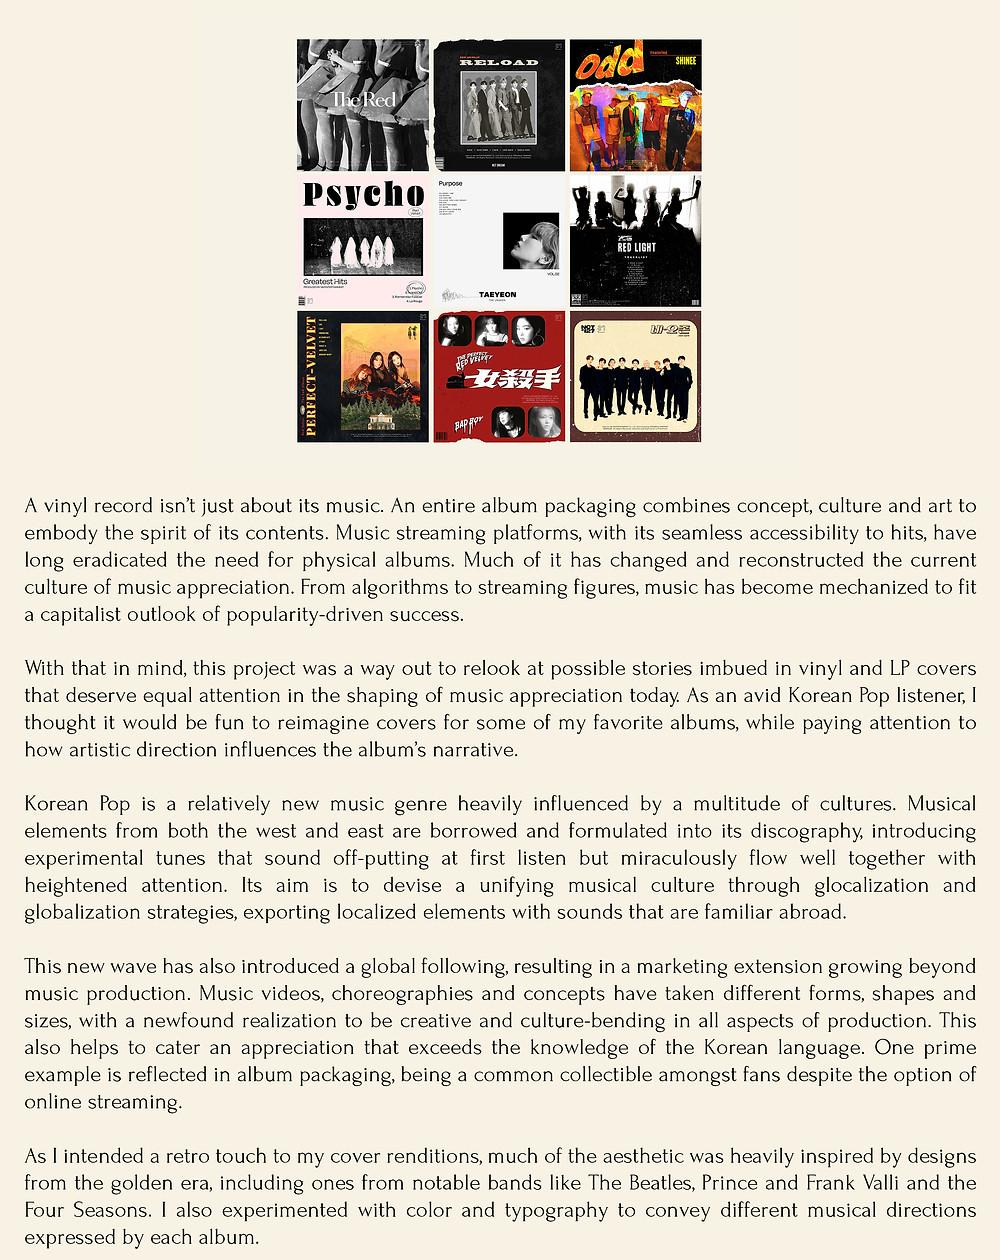 blurb magazine. blurbmag. Sleep on Beds Not Album Art. Darryl Cheong. Arts & Culture. @blurb.mag